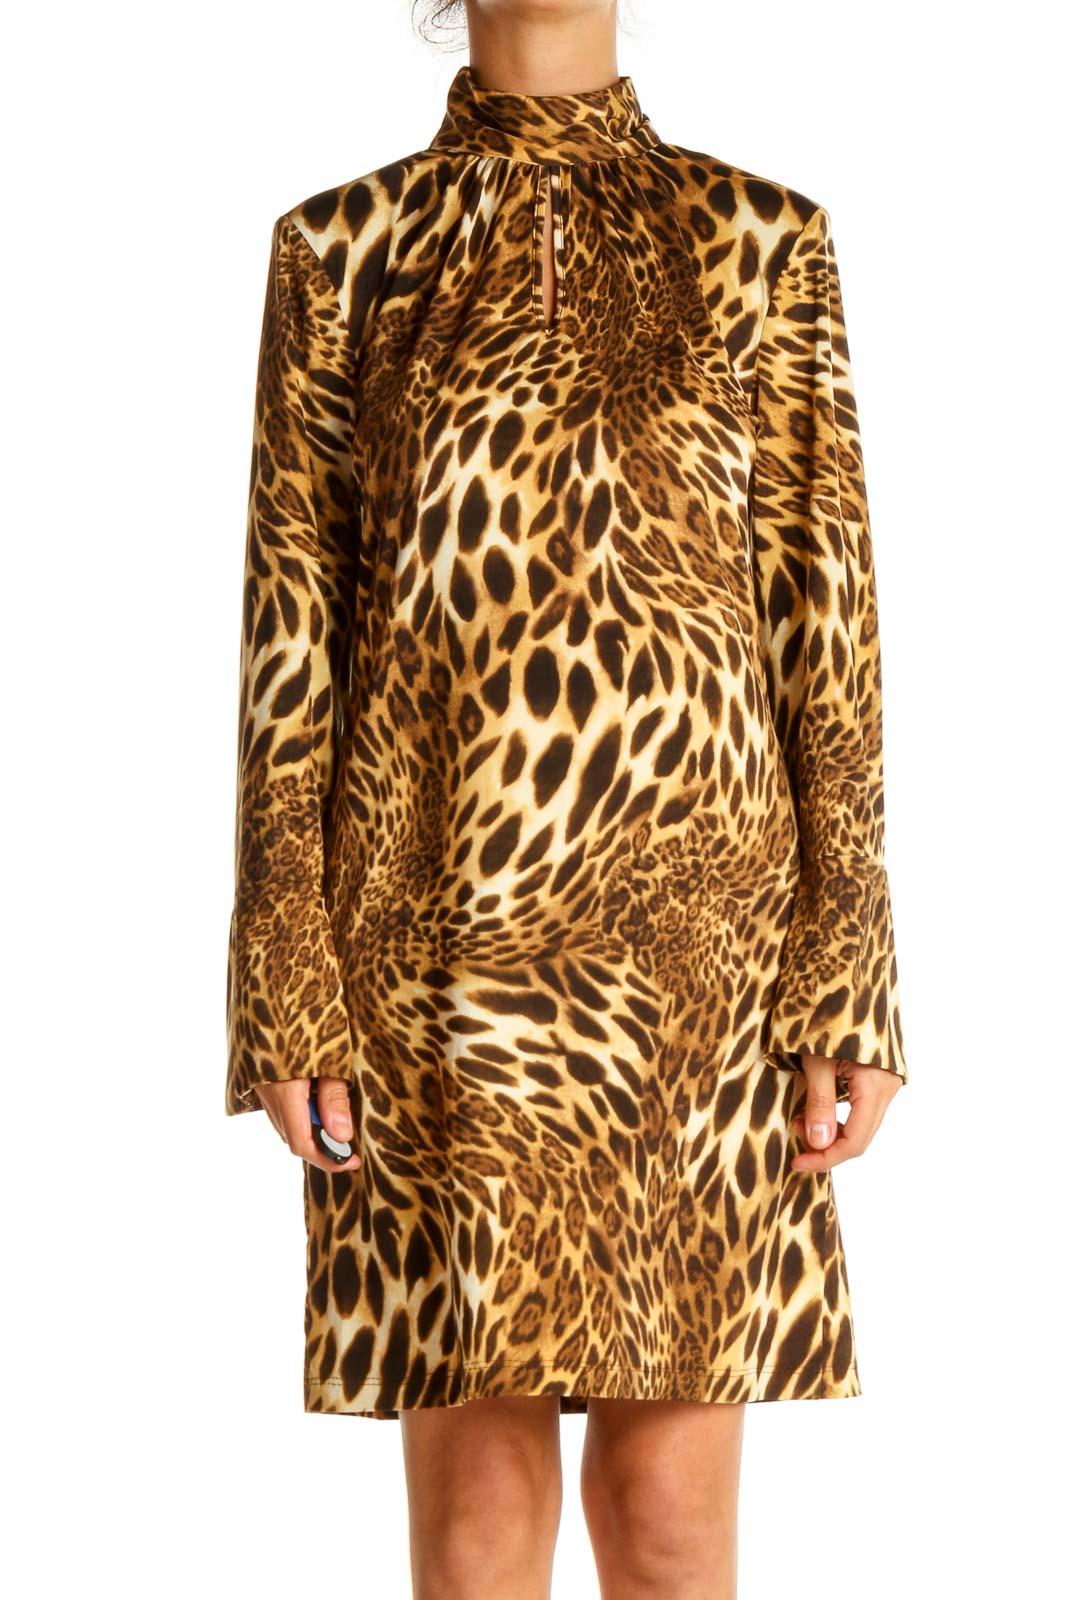 Brown Animal Print Day Sheath Dress Front